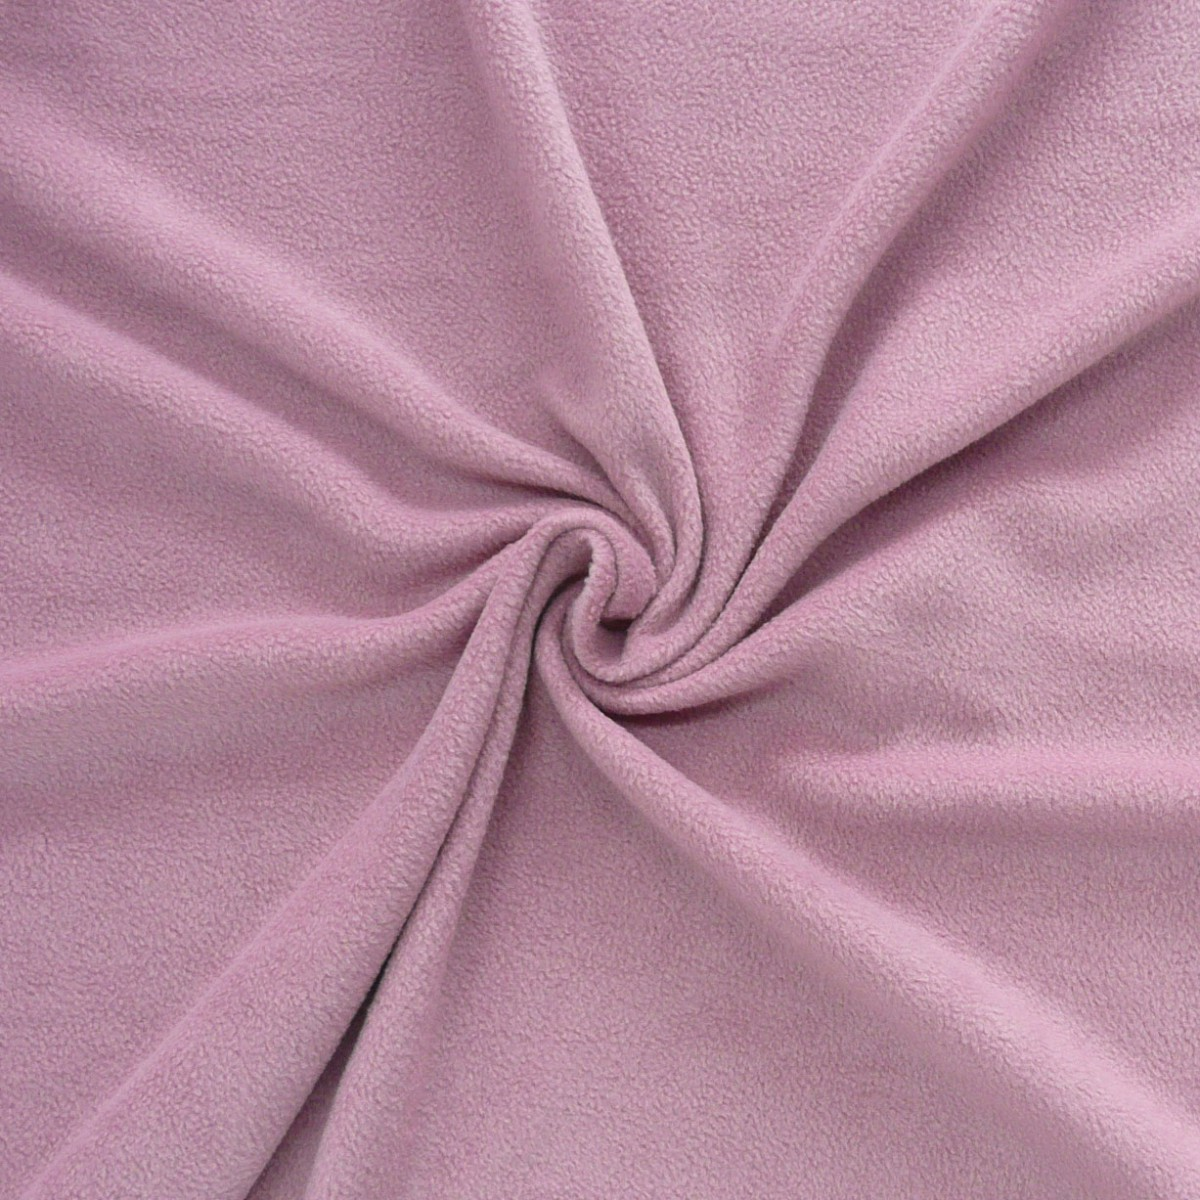 polar fleece stoffe fleecestoff altrosa stoffe stoffe uni fleece. Black Bedroom Furniture Sets. Home Design Ideas